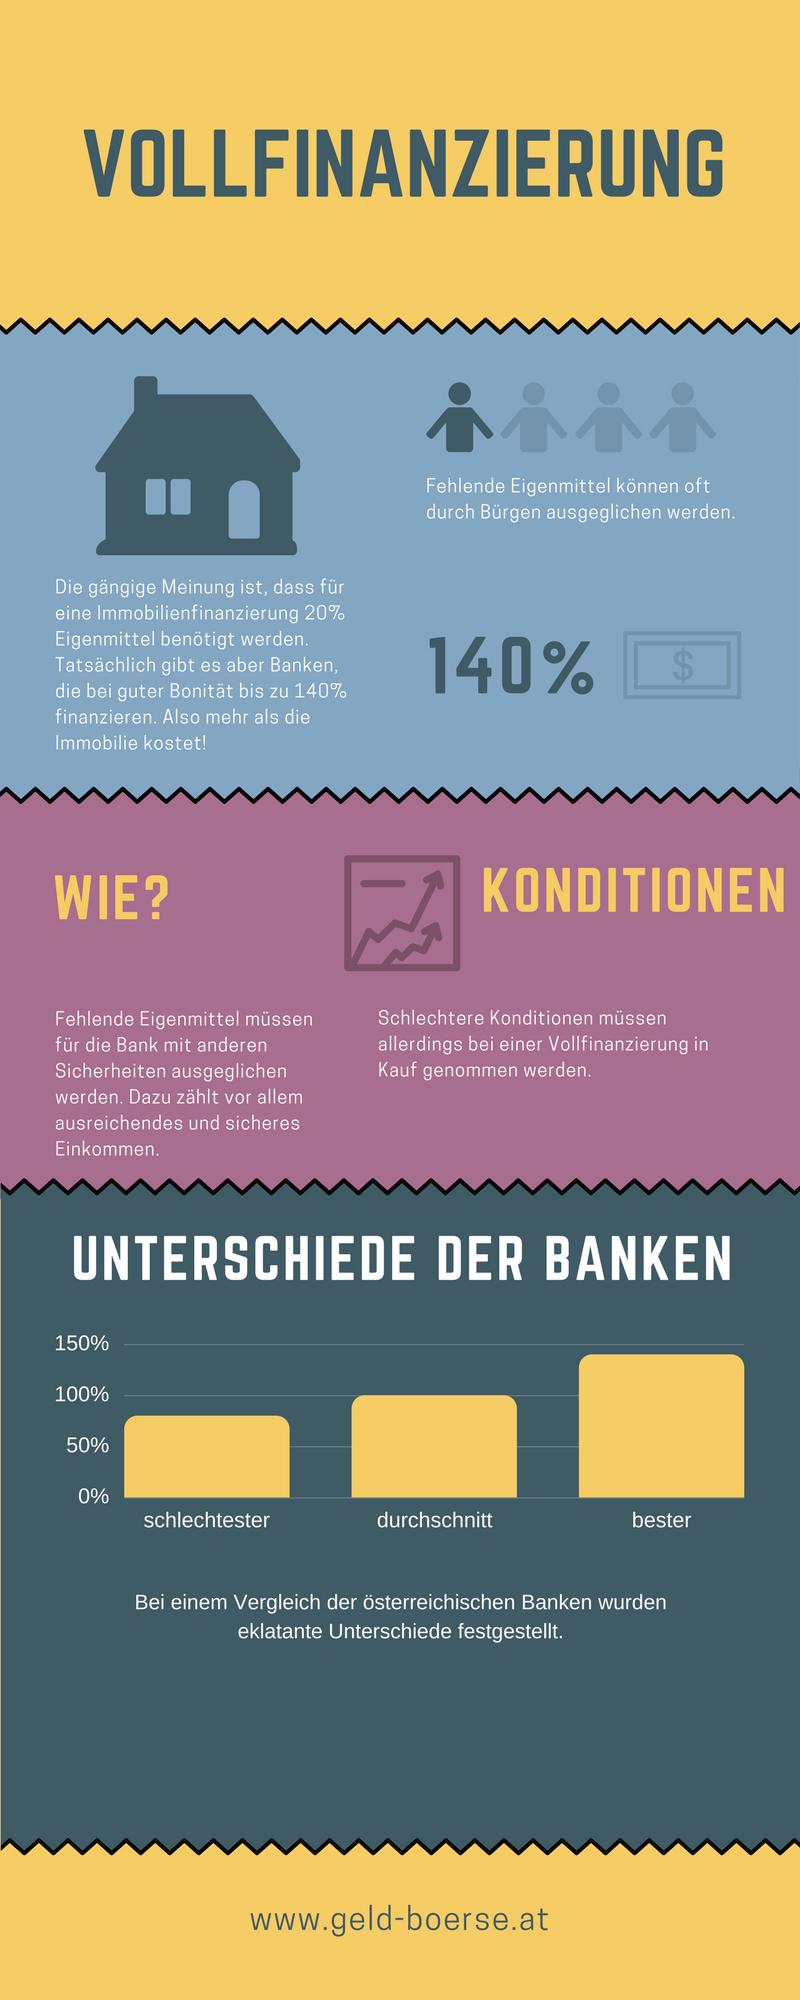 VOLLFinanzierung-infografik